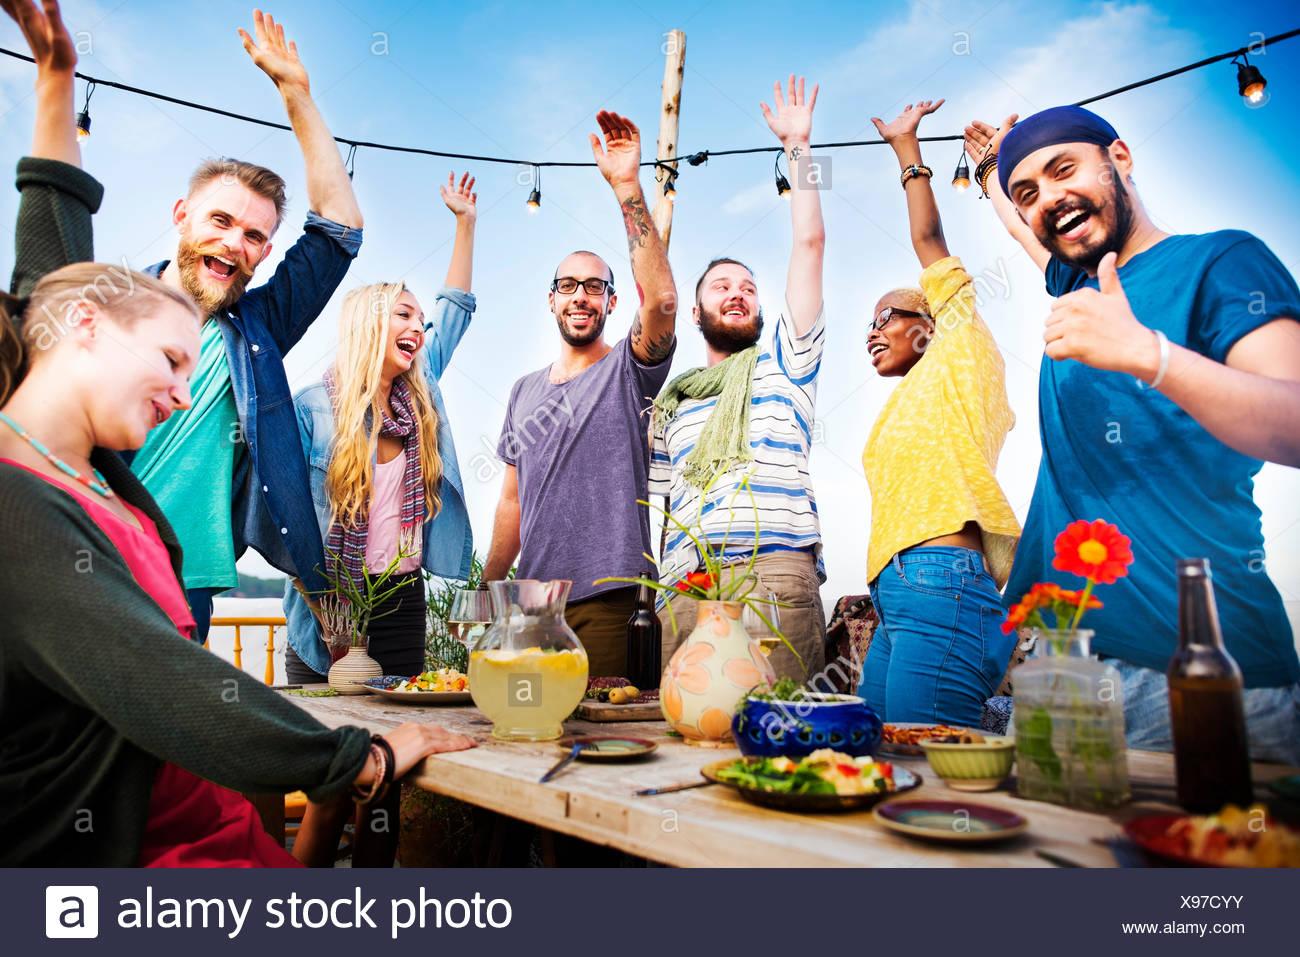 Playa de verano Cena celebración concepto Imagen De Stock